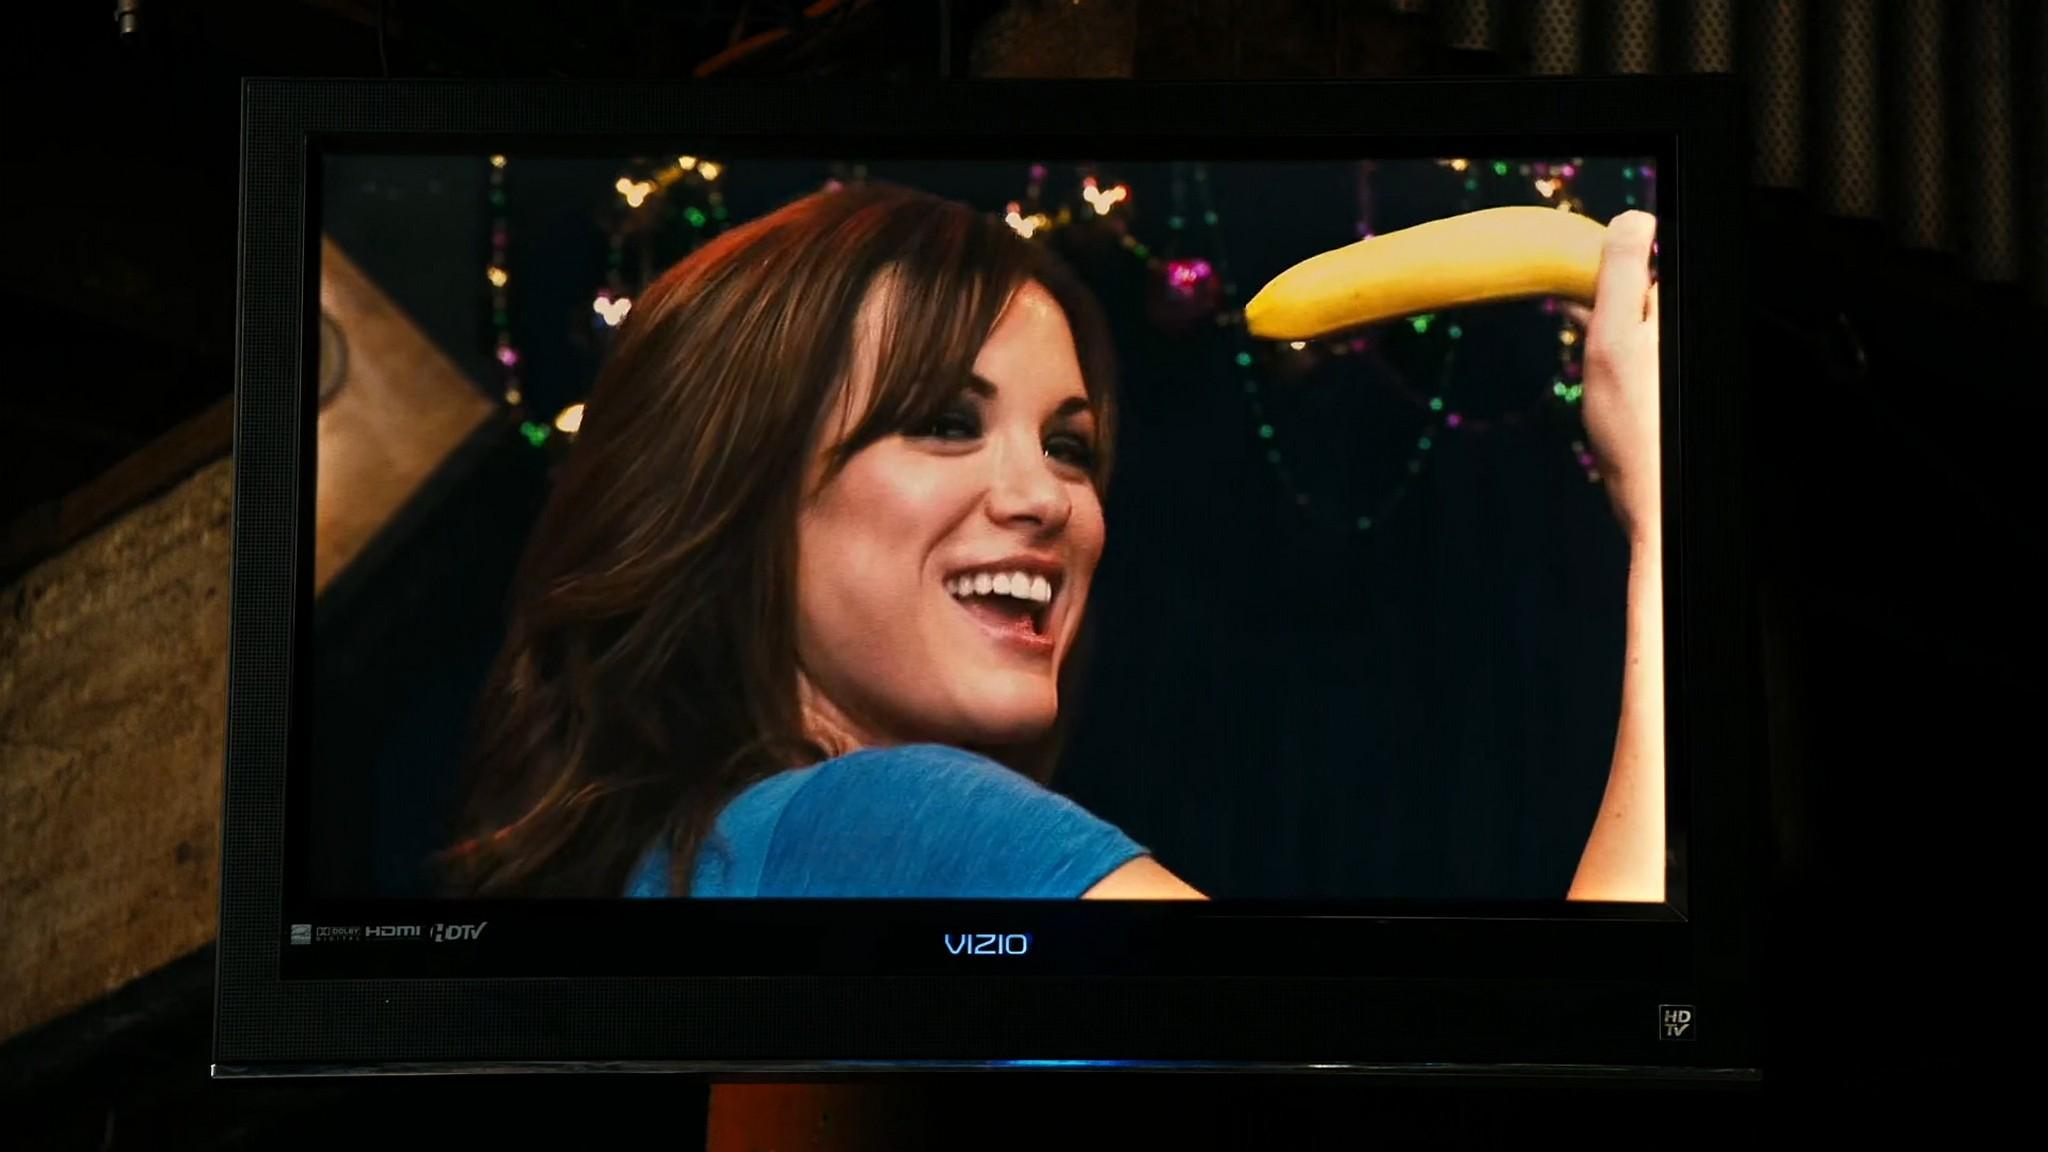 Danneel Ackles nude Carmen Electra, Arielle Kebbel, sexy otherrs nude and hot - Mardi Gras: Spring Break (2011) HD 1080p WEb (11)